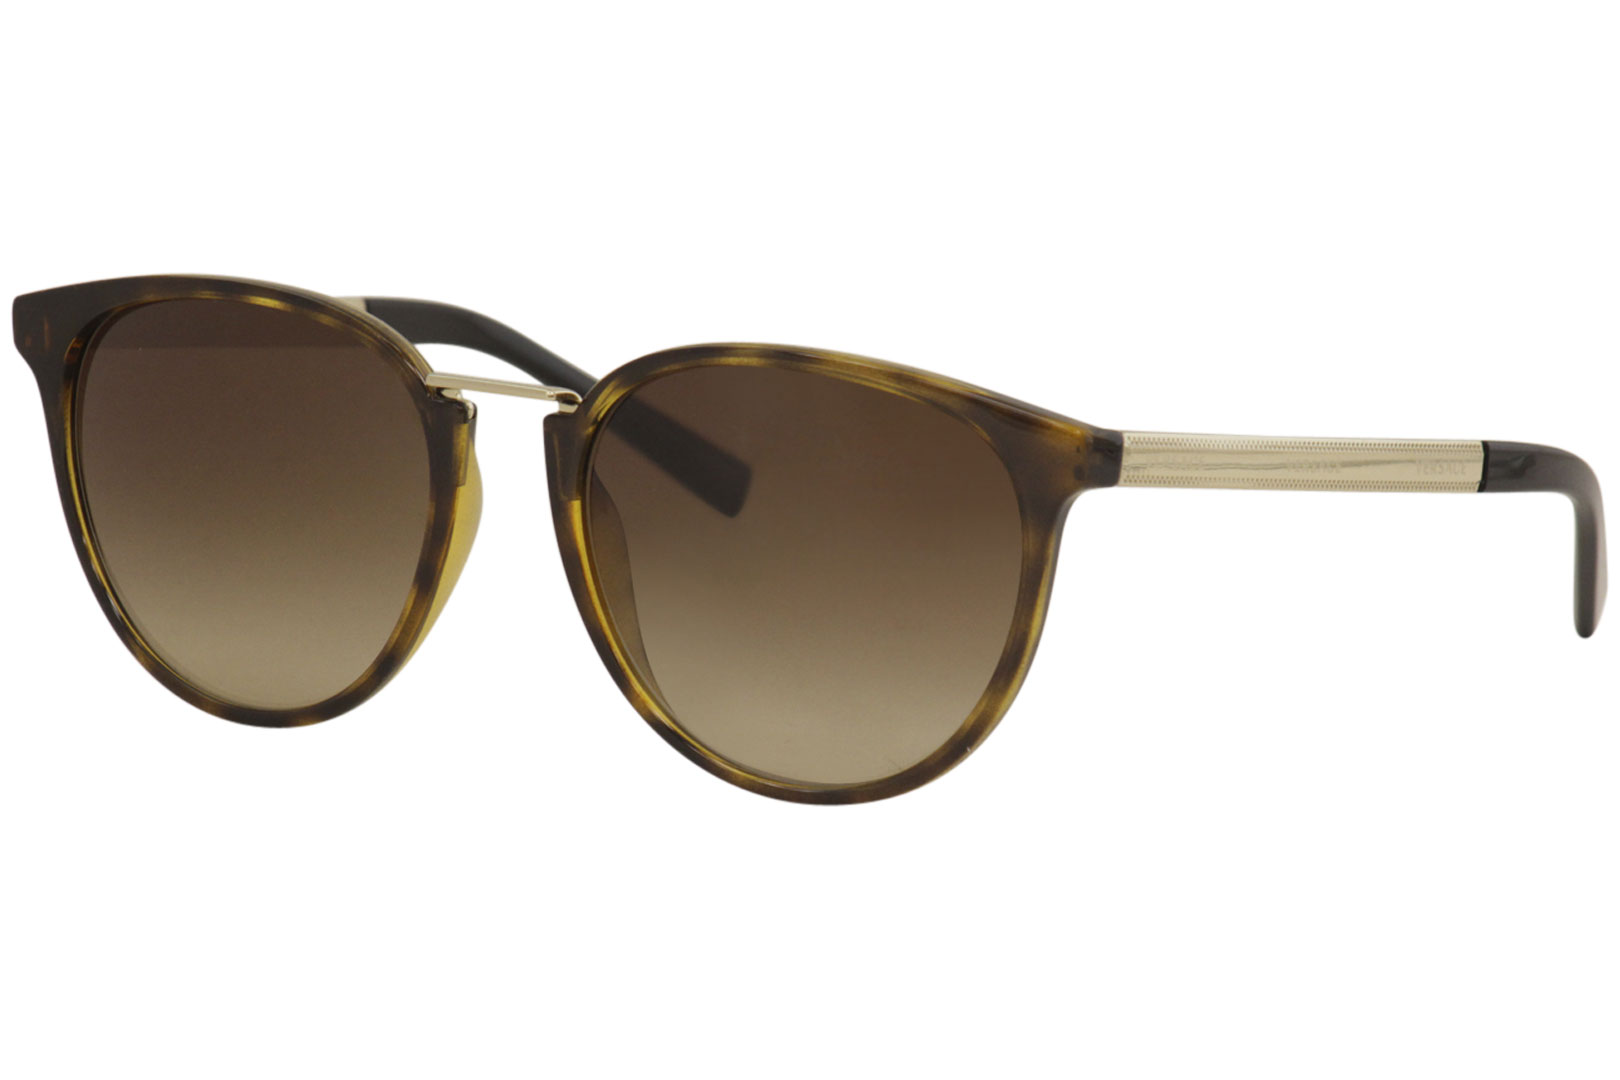 NEW Versace 4366 108//13 Havana 100/% AUTHENTIC